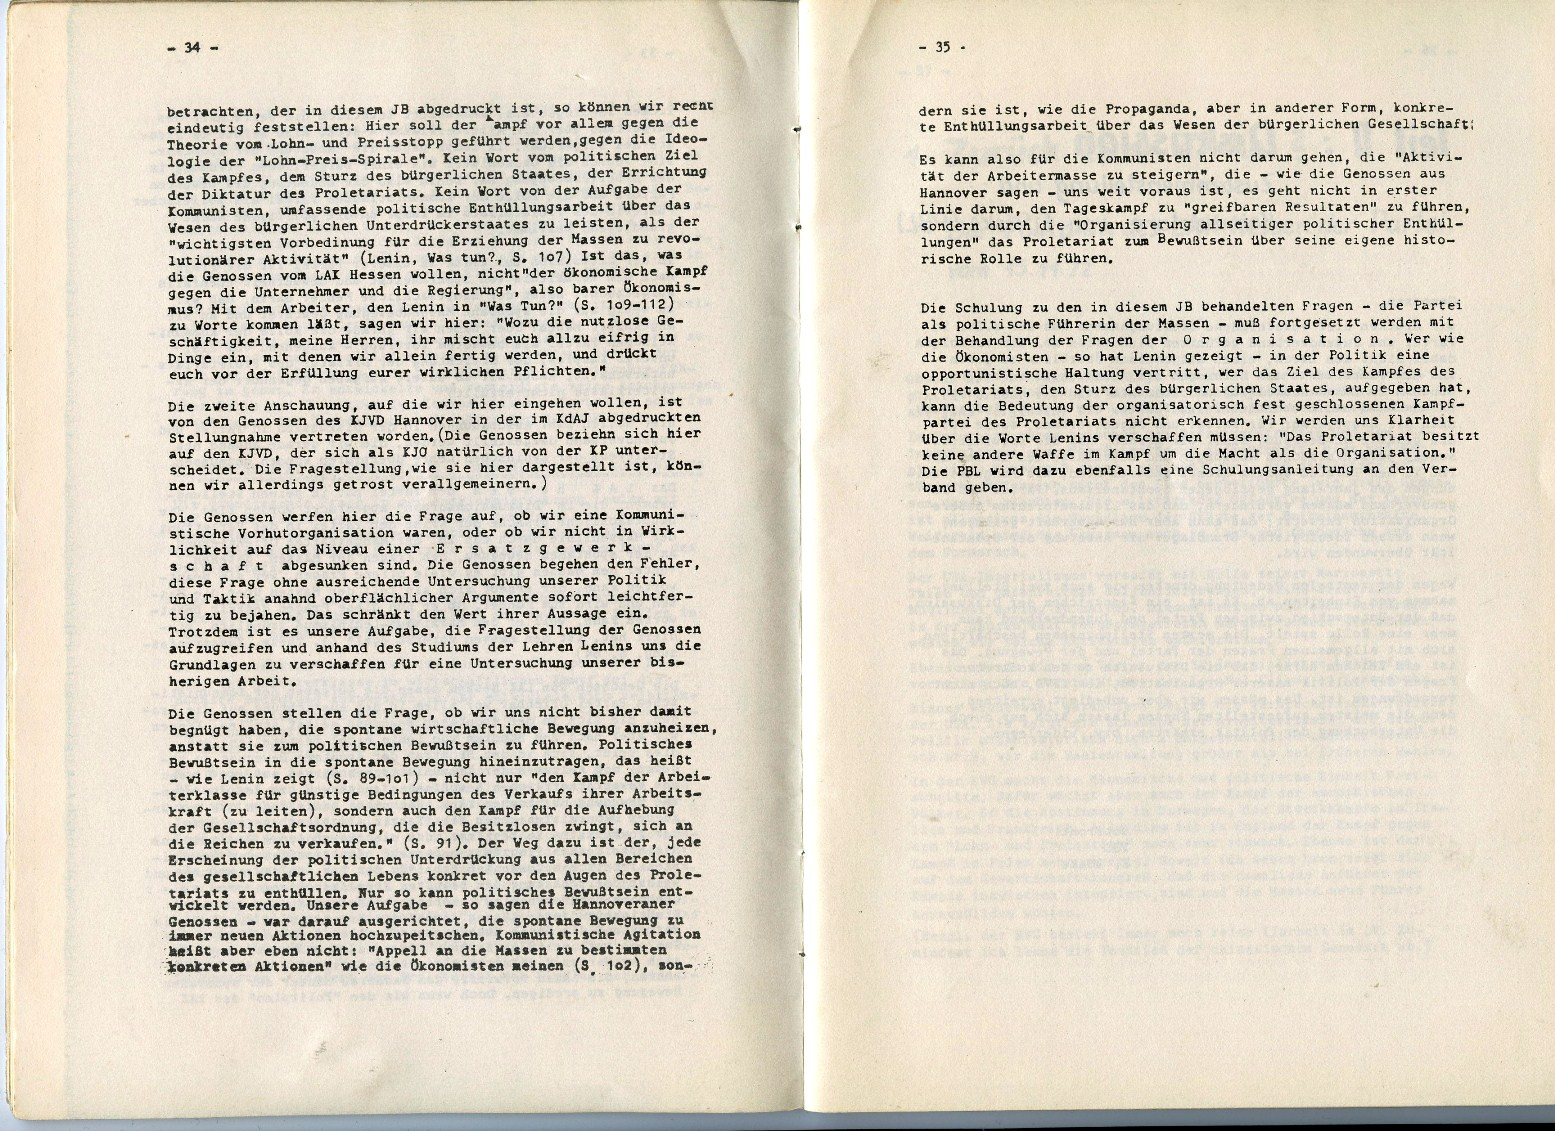 ZB_Universitas_1972_21